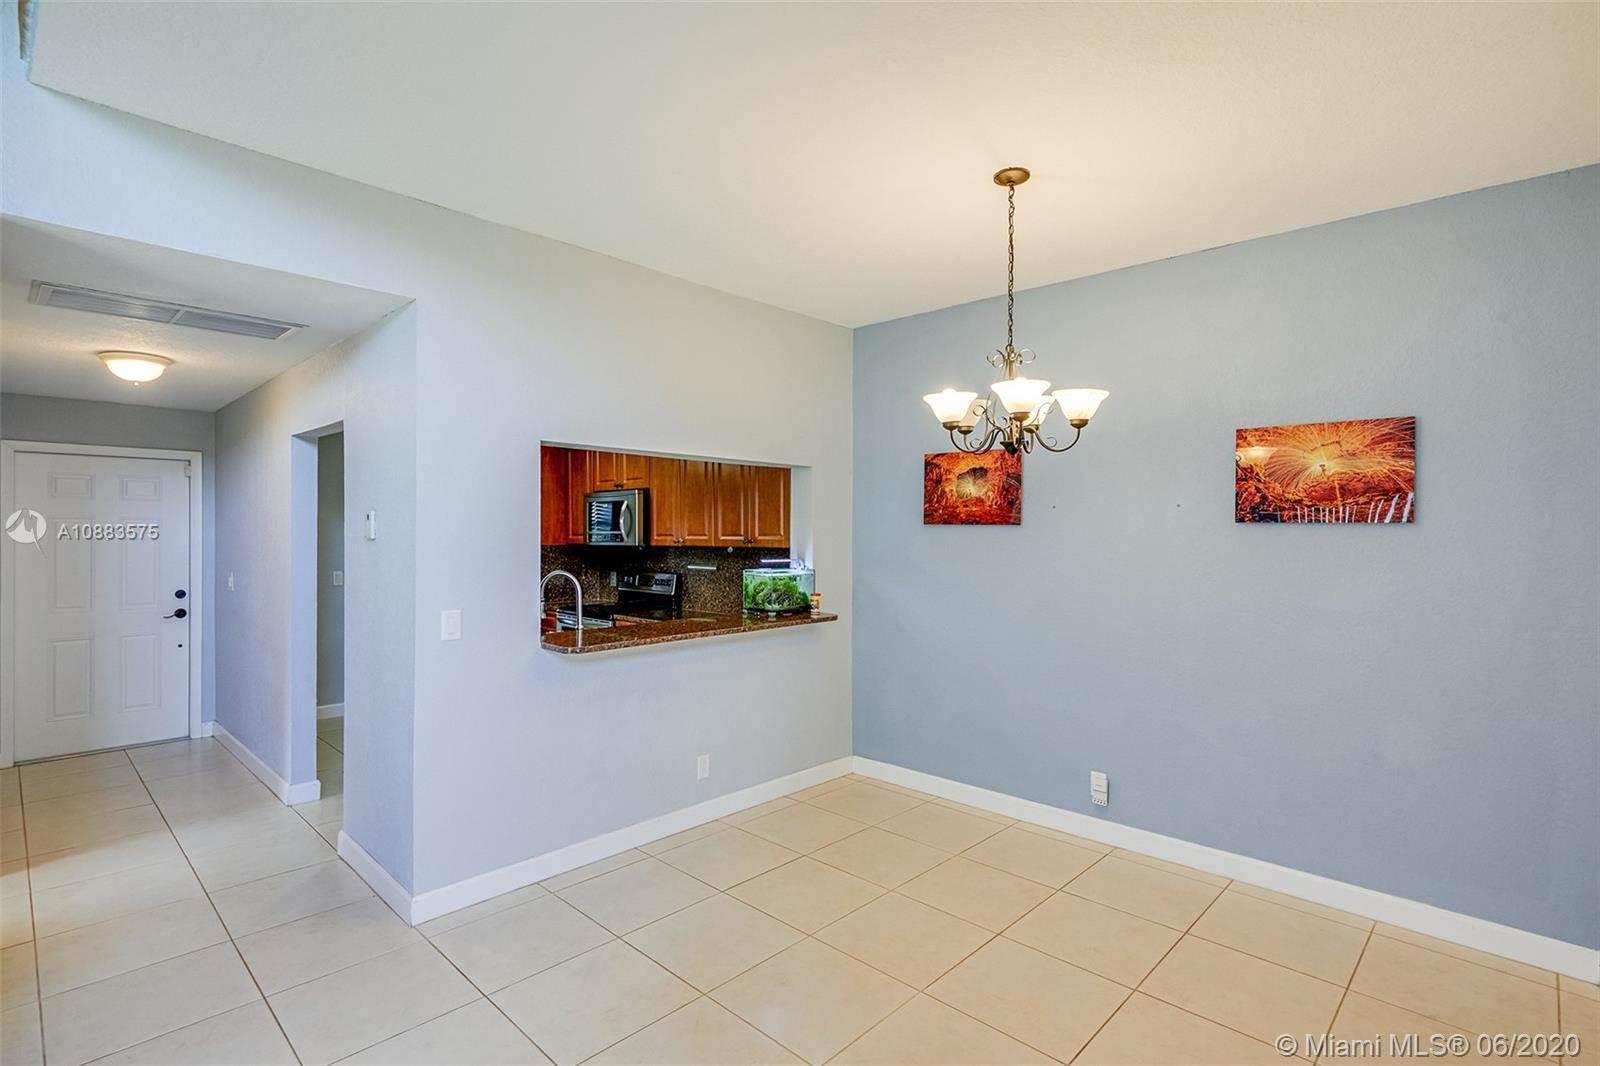 1296 NW 97th Ave, #248, Pembroke Pines, FL 33024